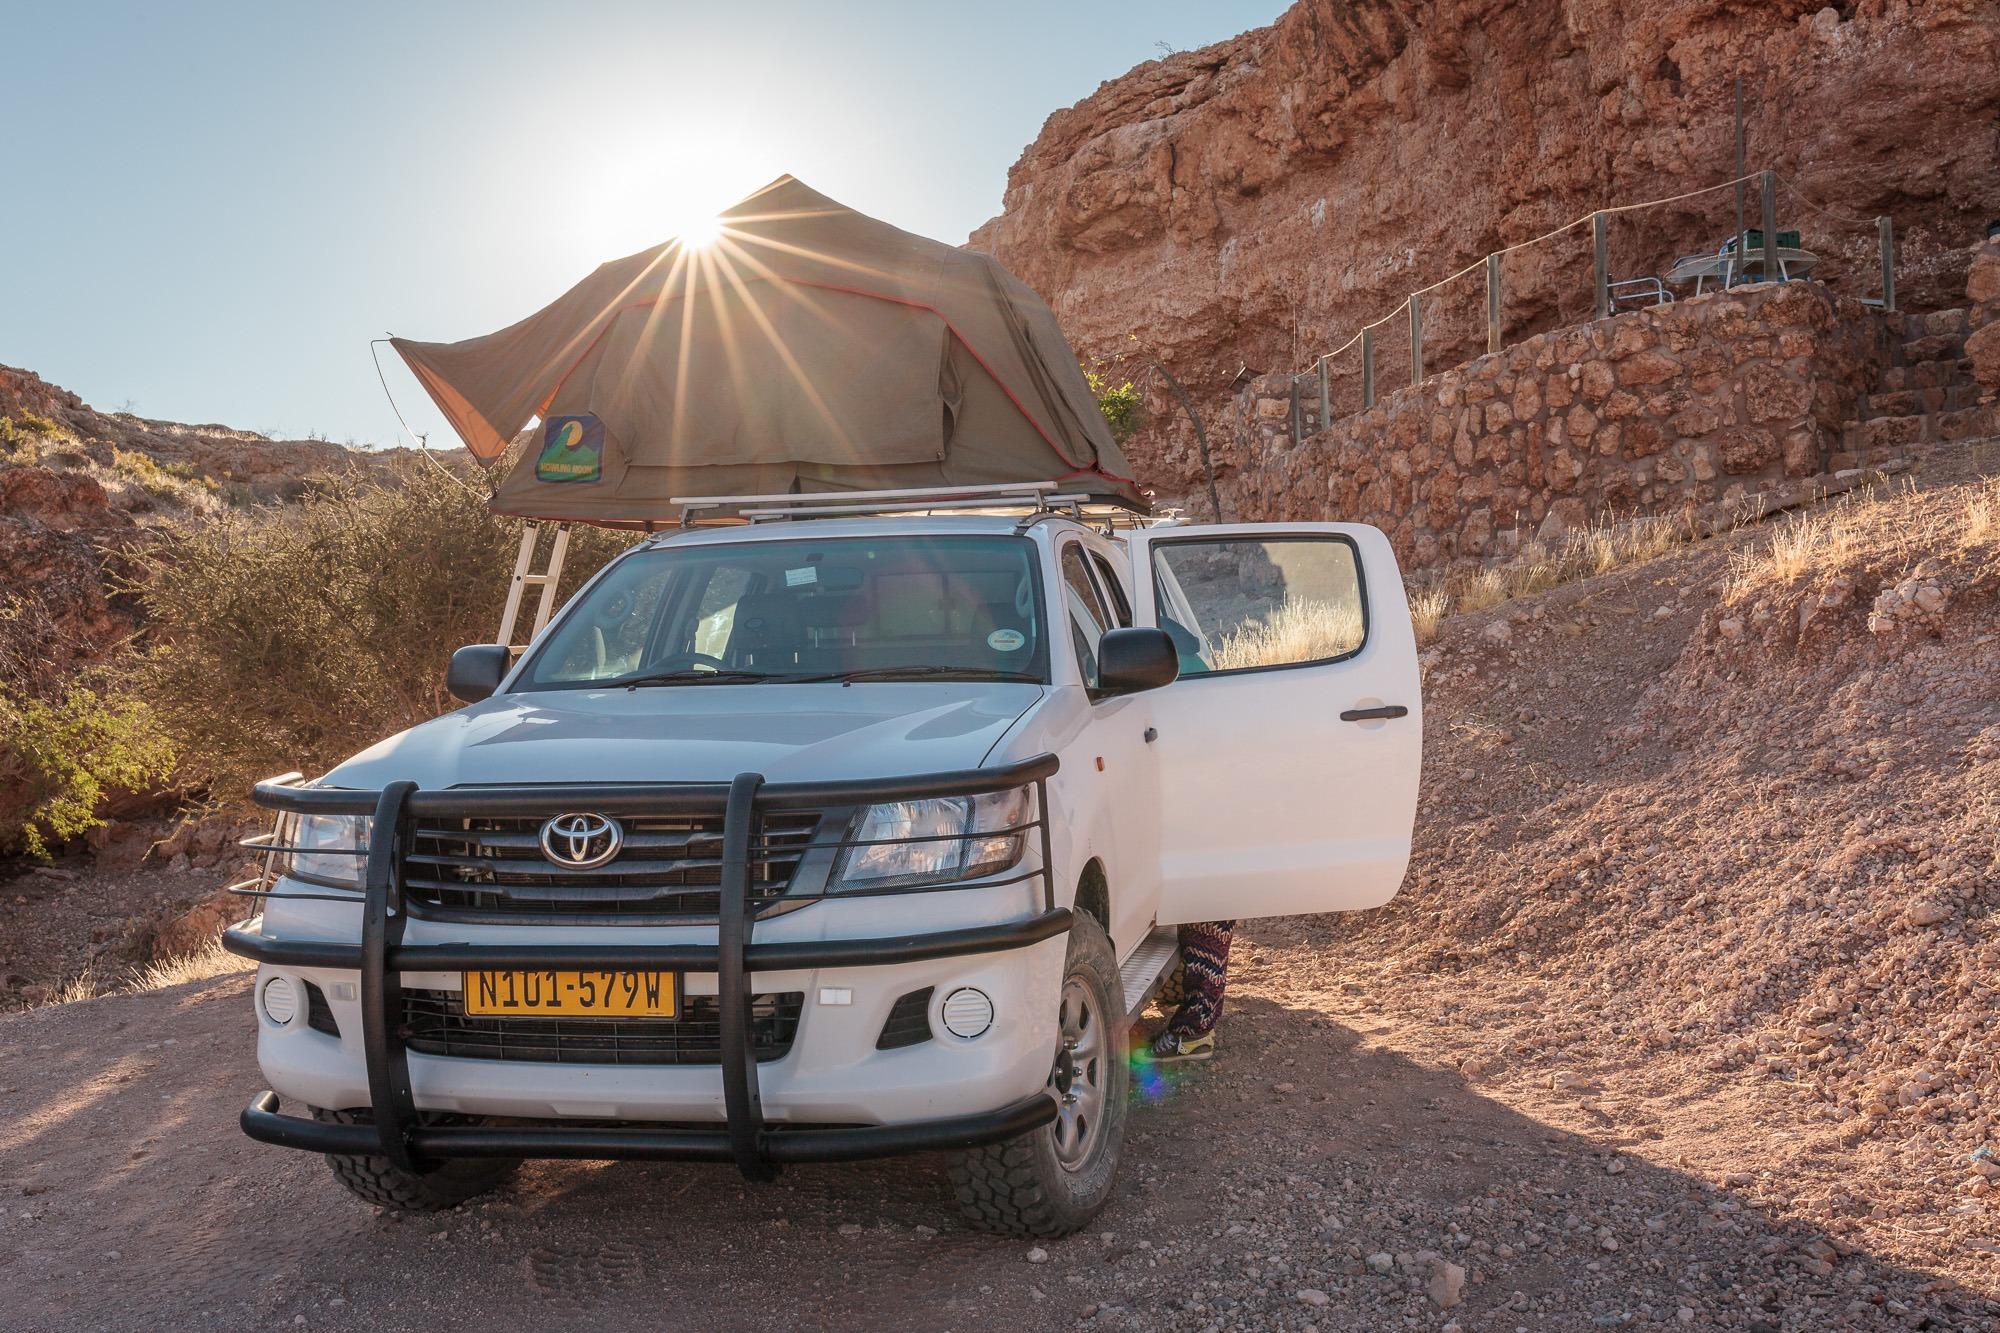 Sonnenaufgang Camping Toyata Hillux Dachzelt Wildmoor Nature Camp Namibia